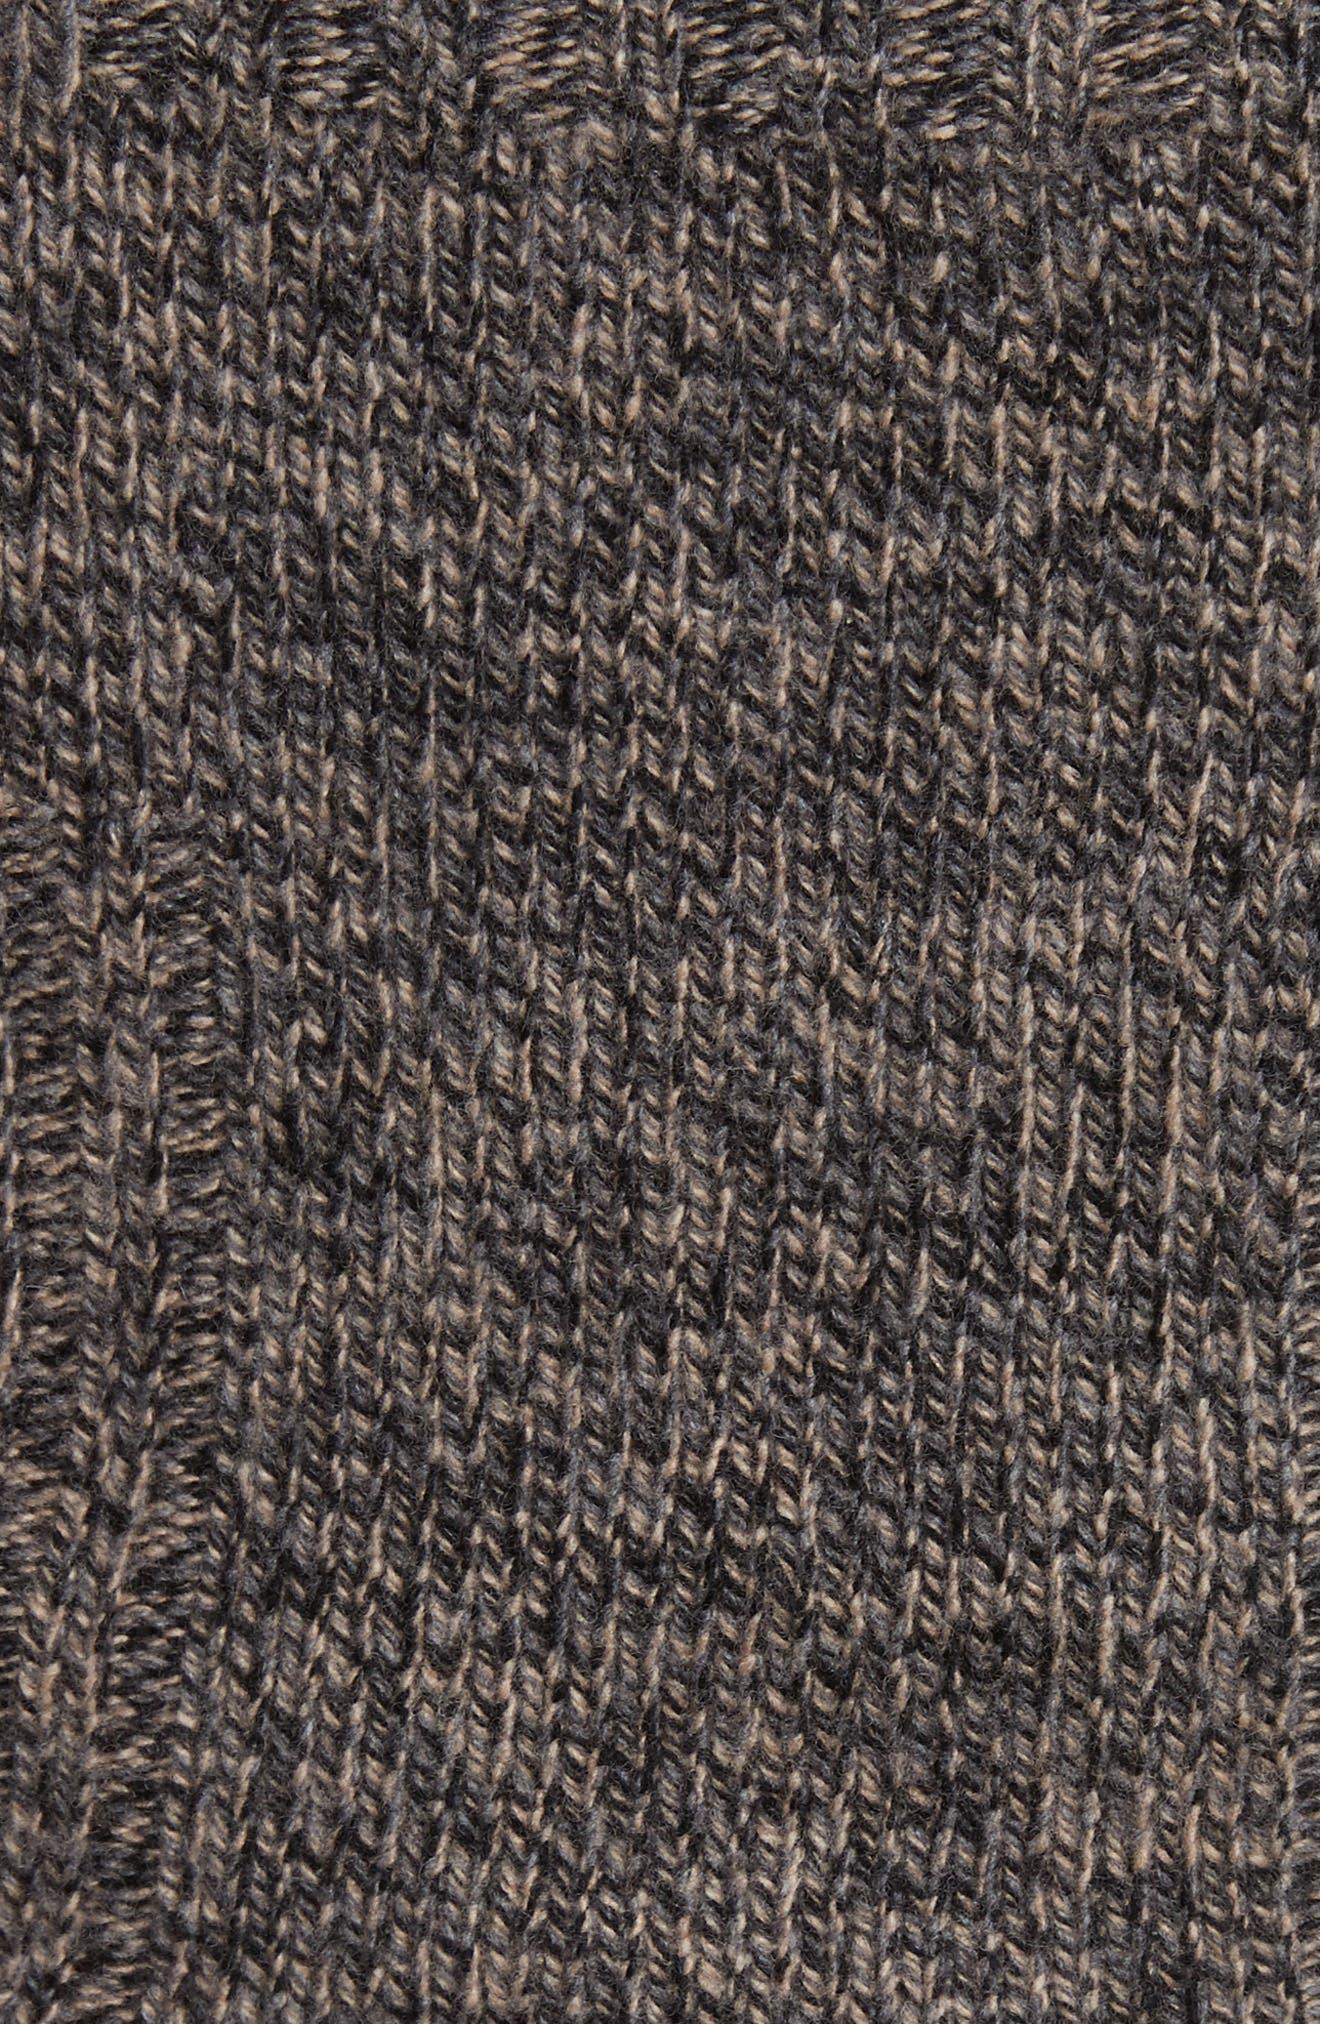 Mouline Wool Blend Sweater Tank,                             Alternate thumbnail 6, color,                             Deserto/ Nero